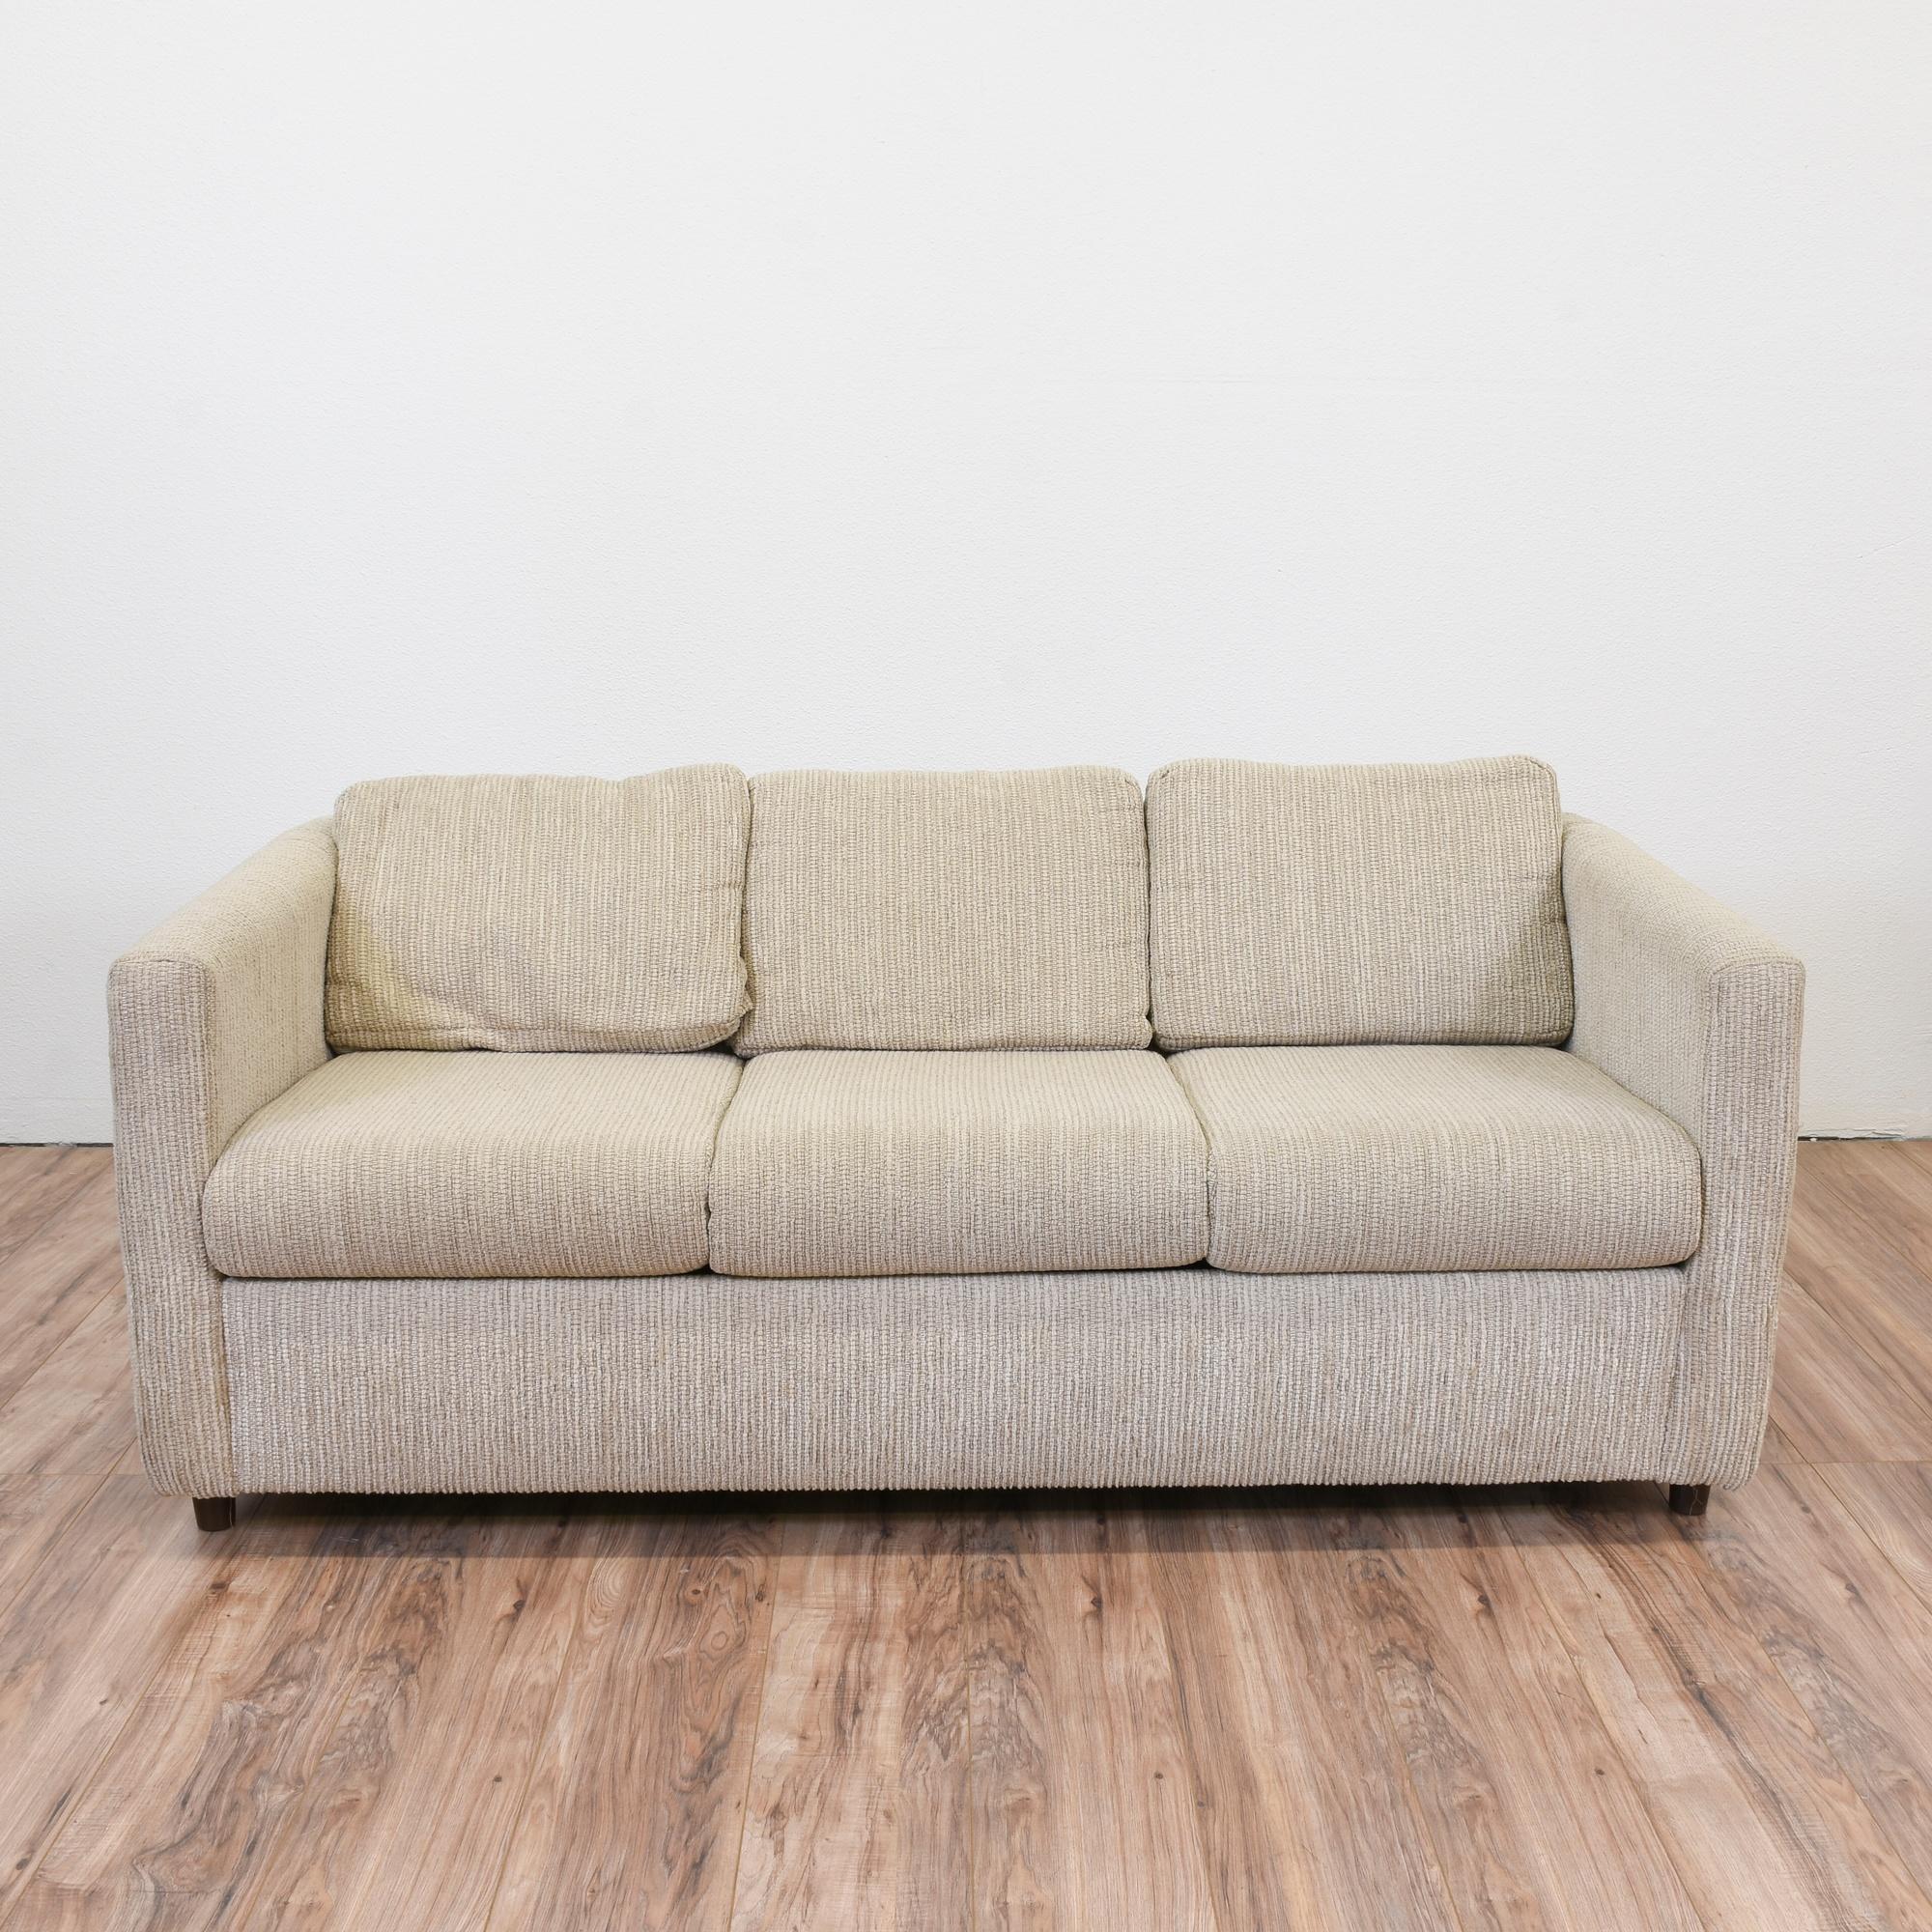 Beige Corduroy Sleeper Sofa | Loveseat Vintage Furniture San Diego